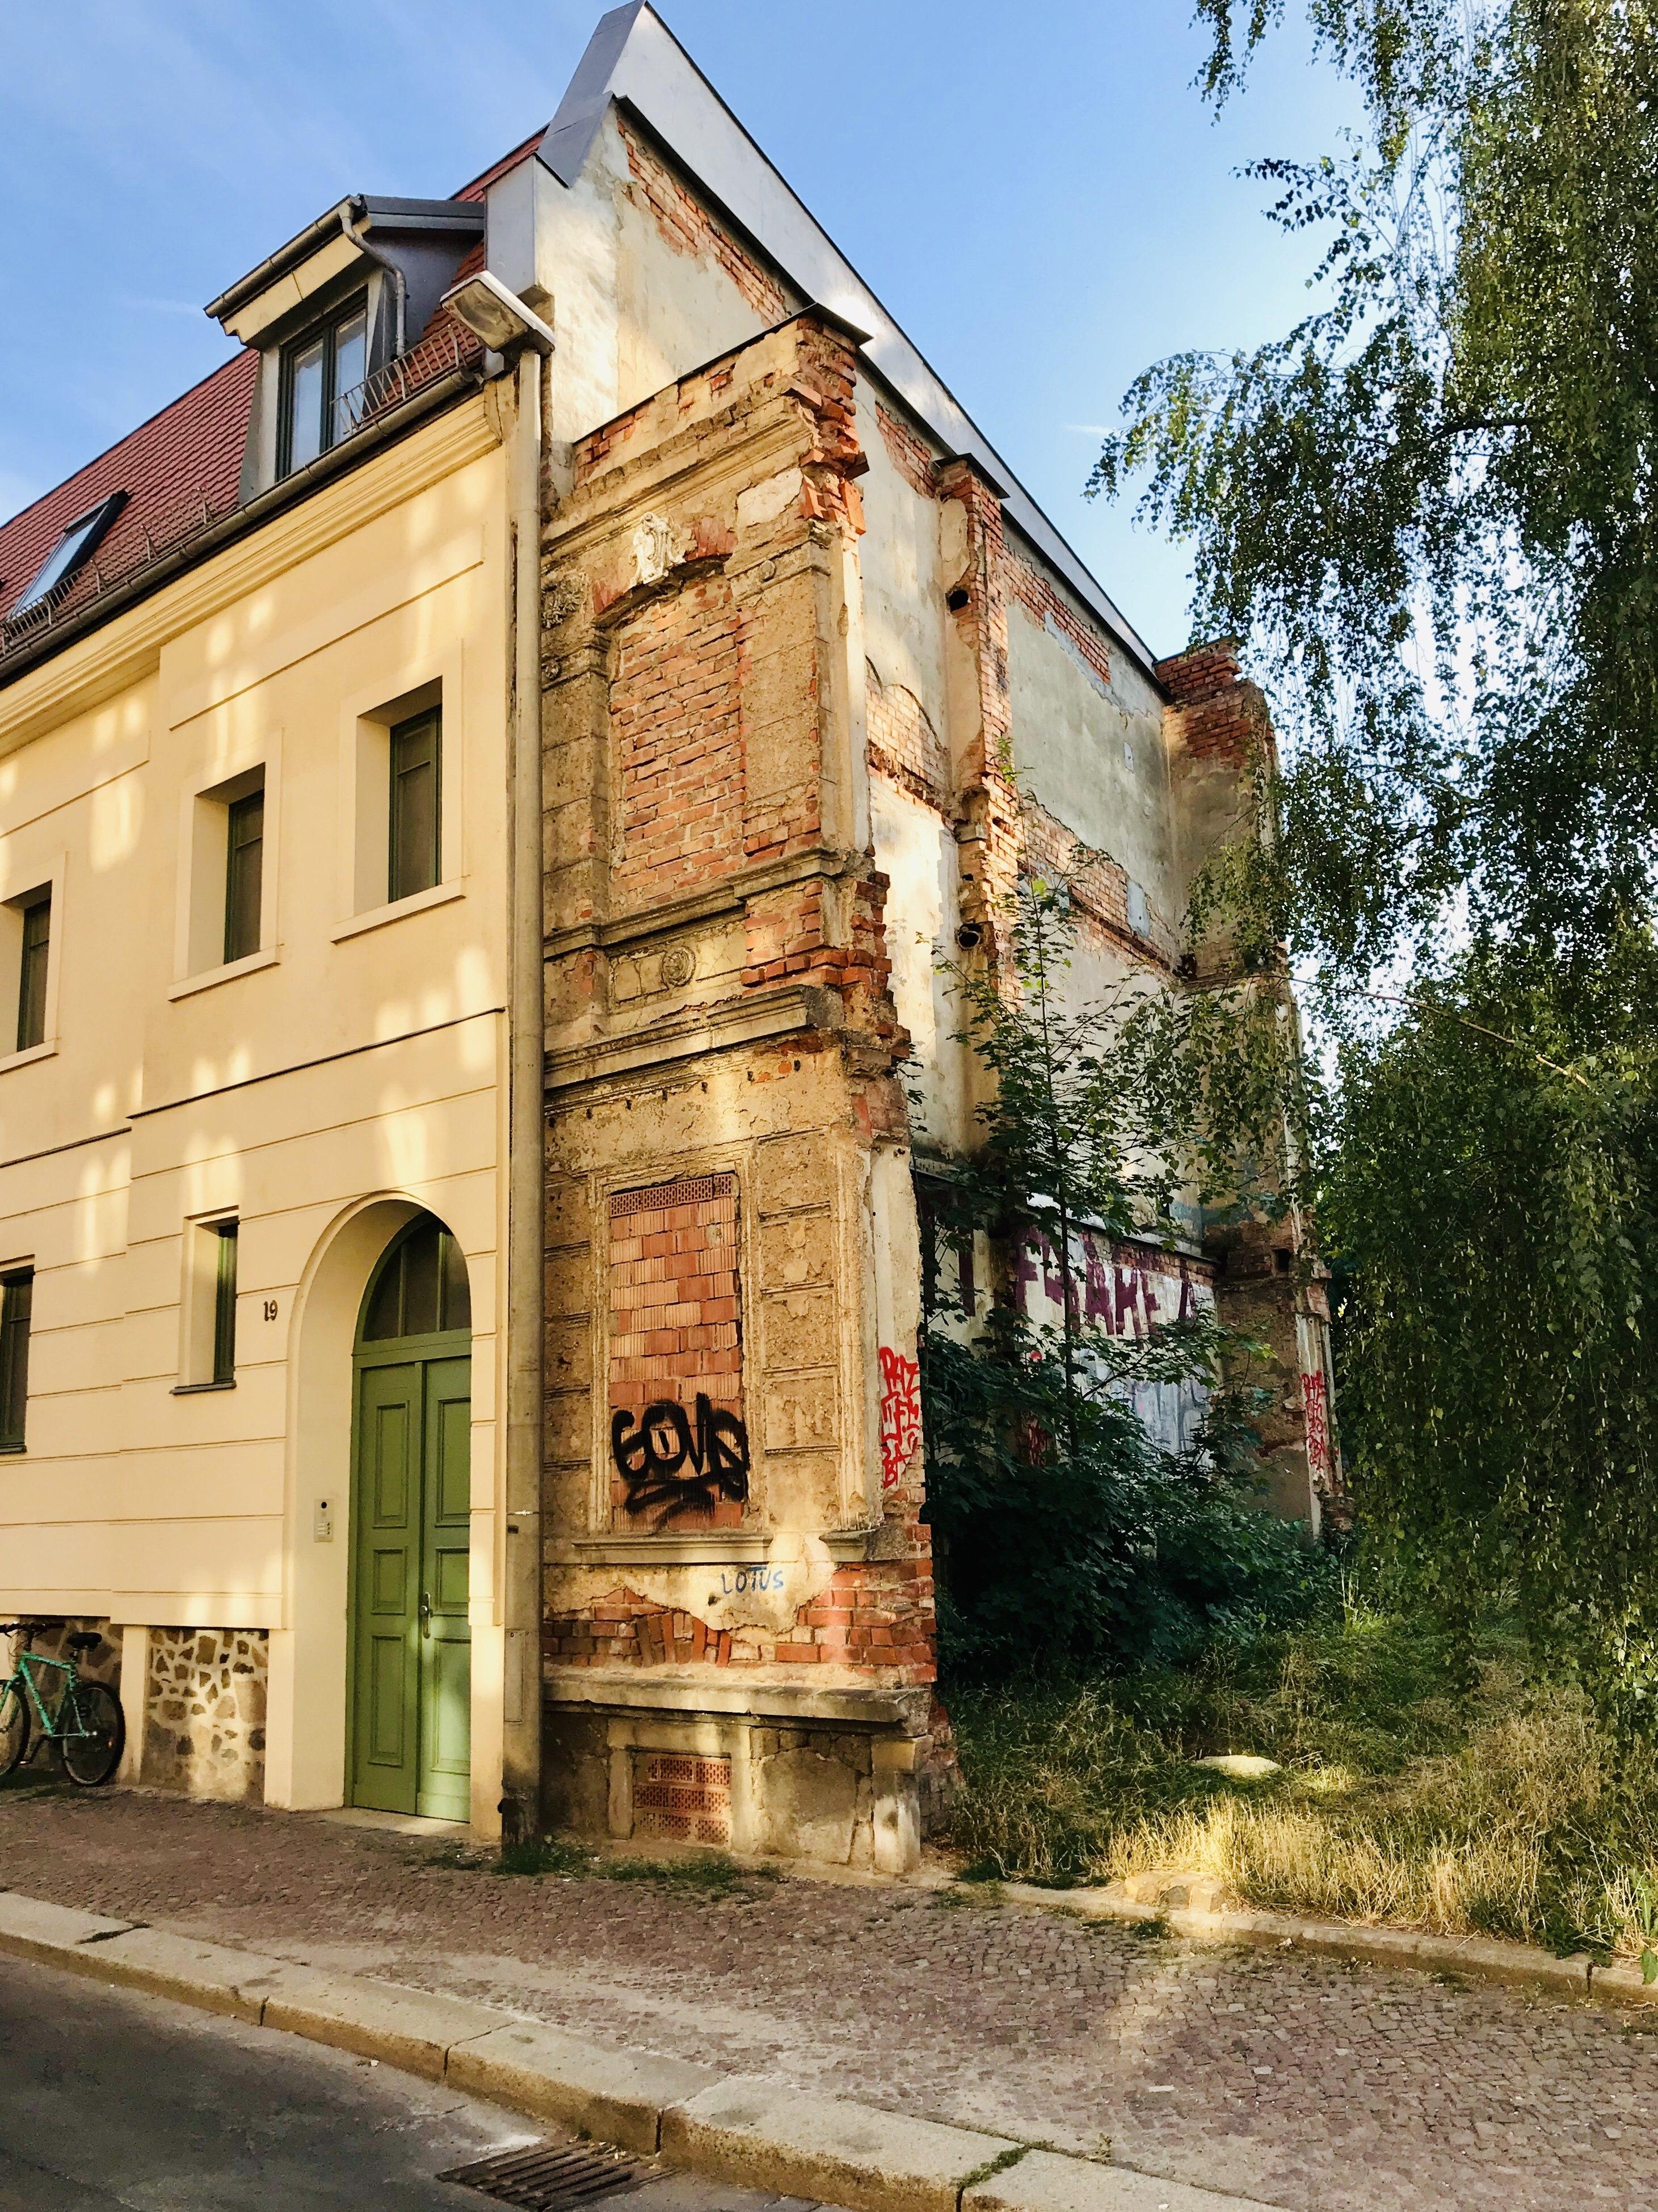 Altbau in Altlindenau, Leipzig